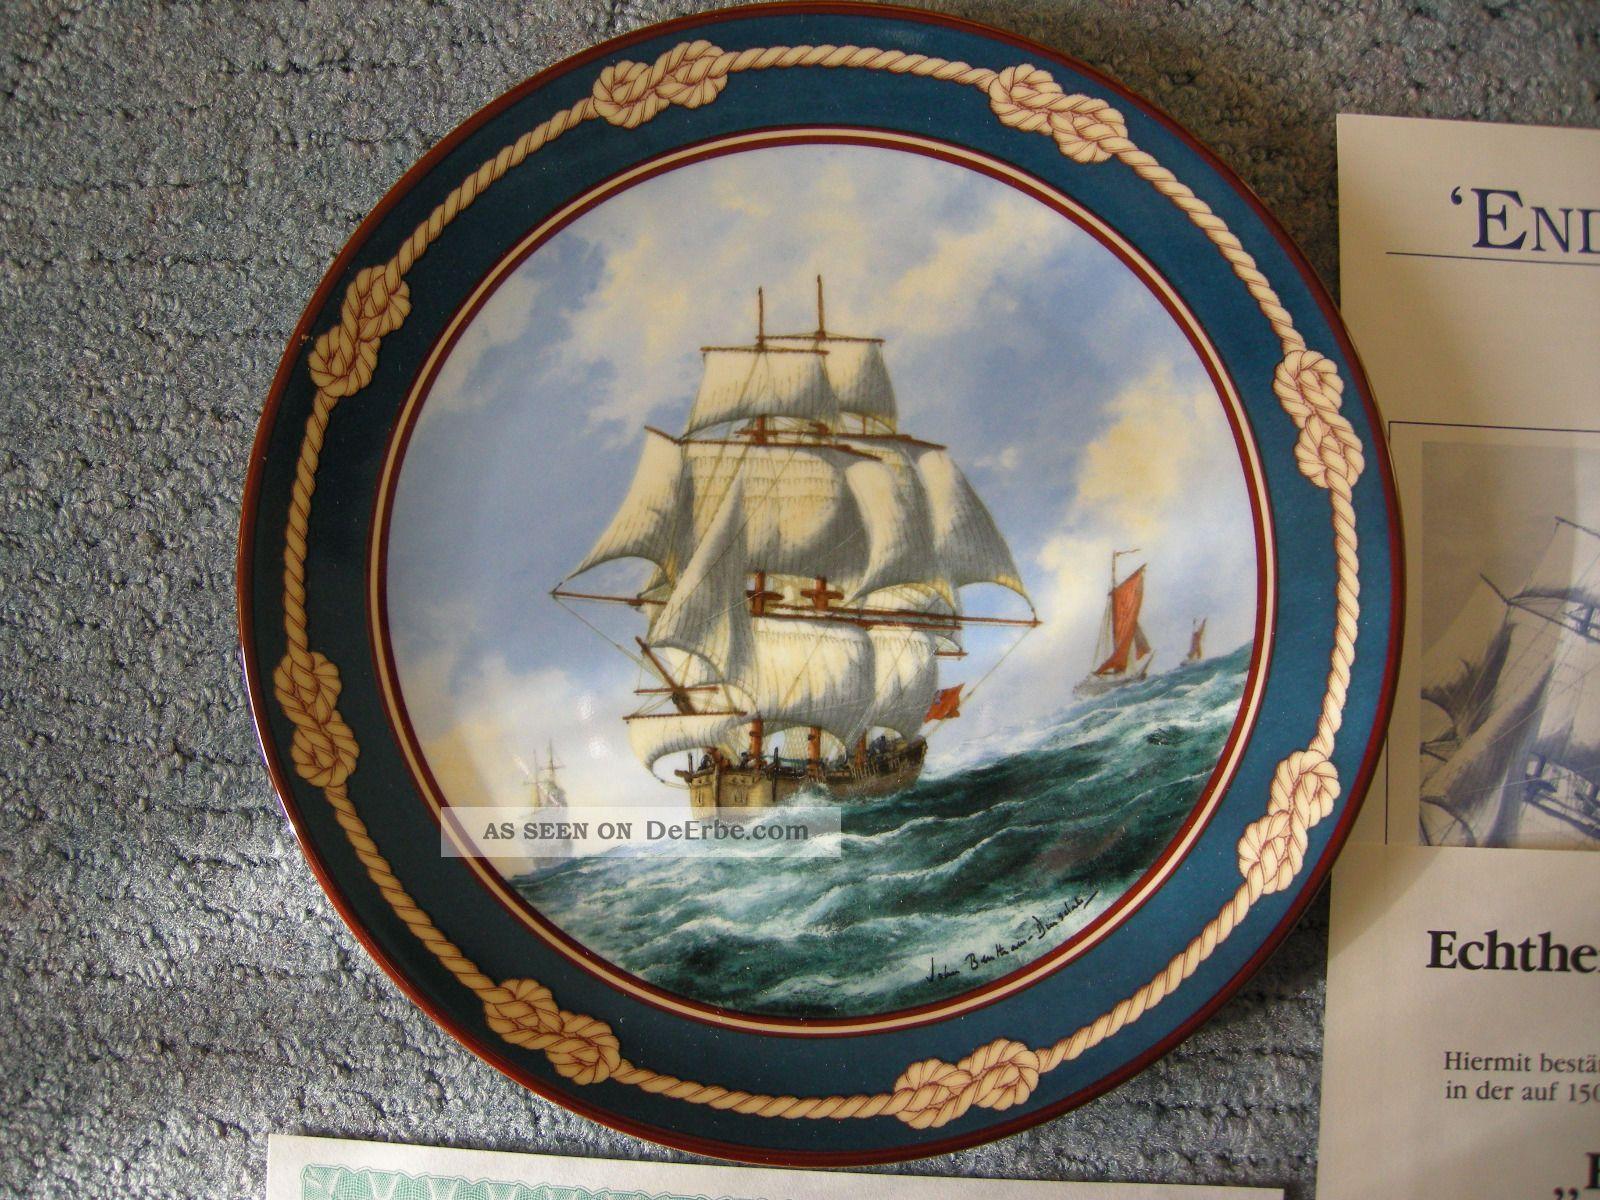 Royal Doulton Sammelteller Endeavour Bentham - Dinsdale Segelschiff 26 - R62 - 26.  1 Nautika & Maritimes Bild